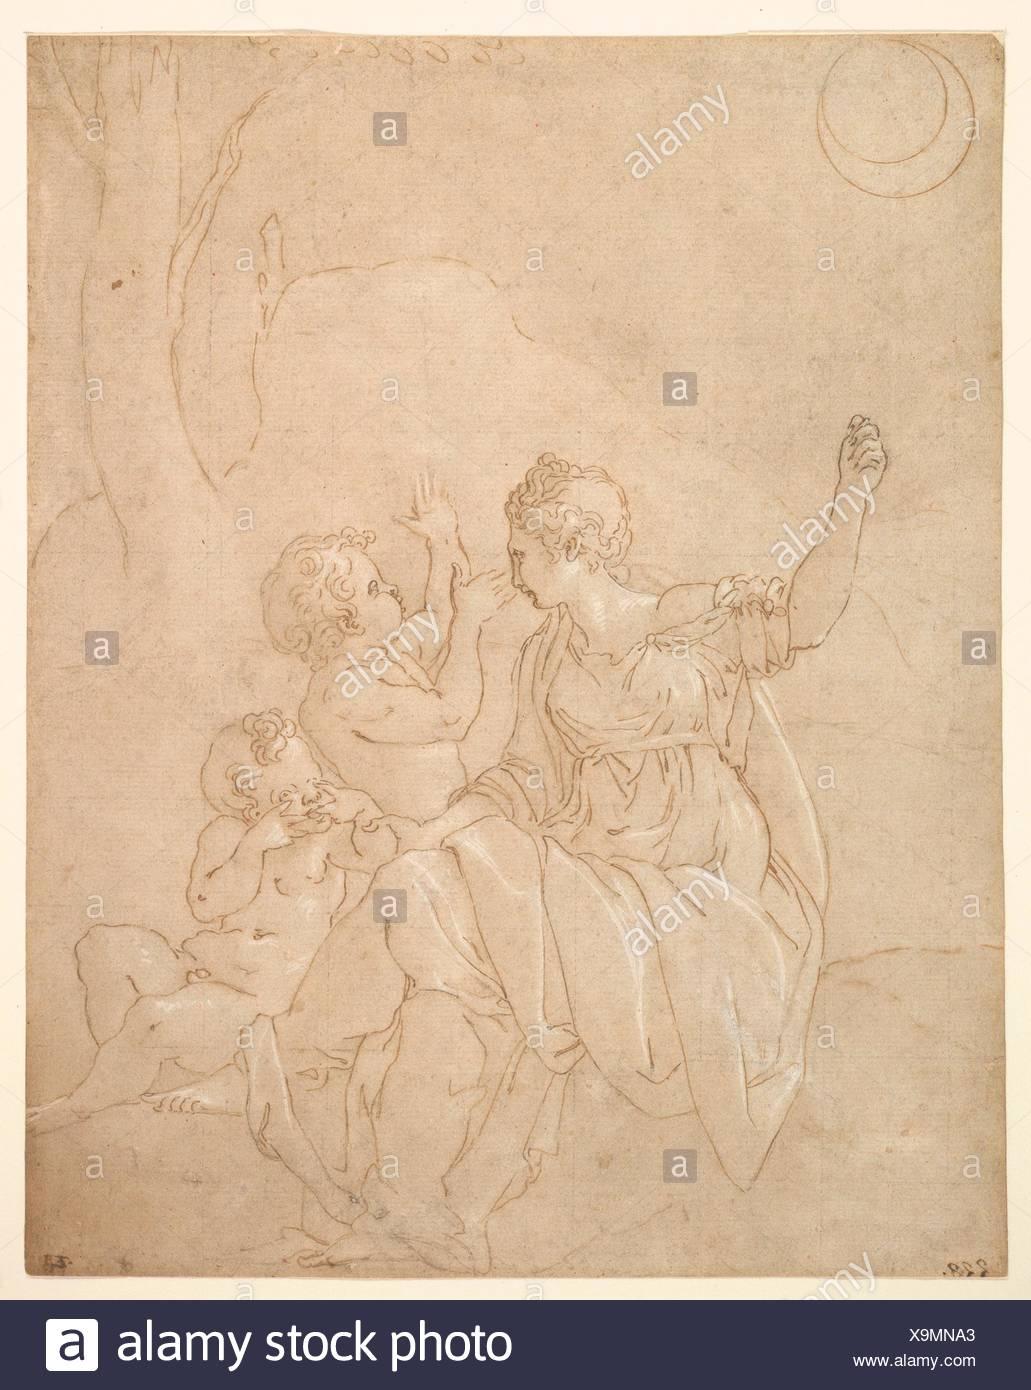 Classical Female Figure (Diana or Venus) with Two Infants. Artist: Francesco Primaticcio (Italian, Bologna 1504/5-1570 Paris); Date: ca. 1539-42; - Stock Image